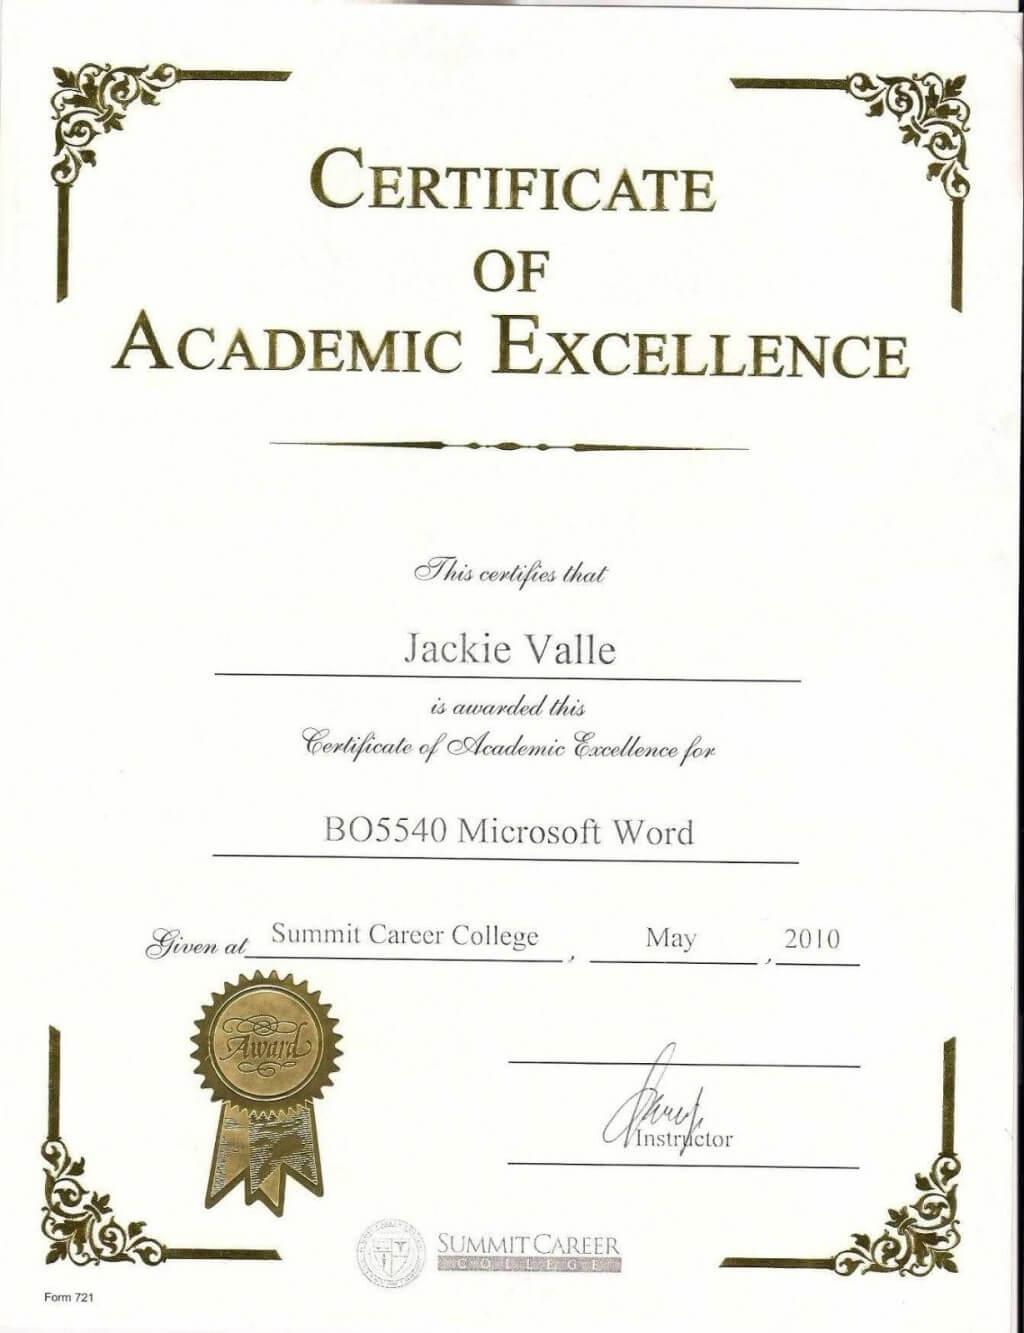 006 Terrific Award Certificate Template Word Sample For Academic Award Certificate Template